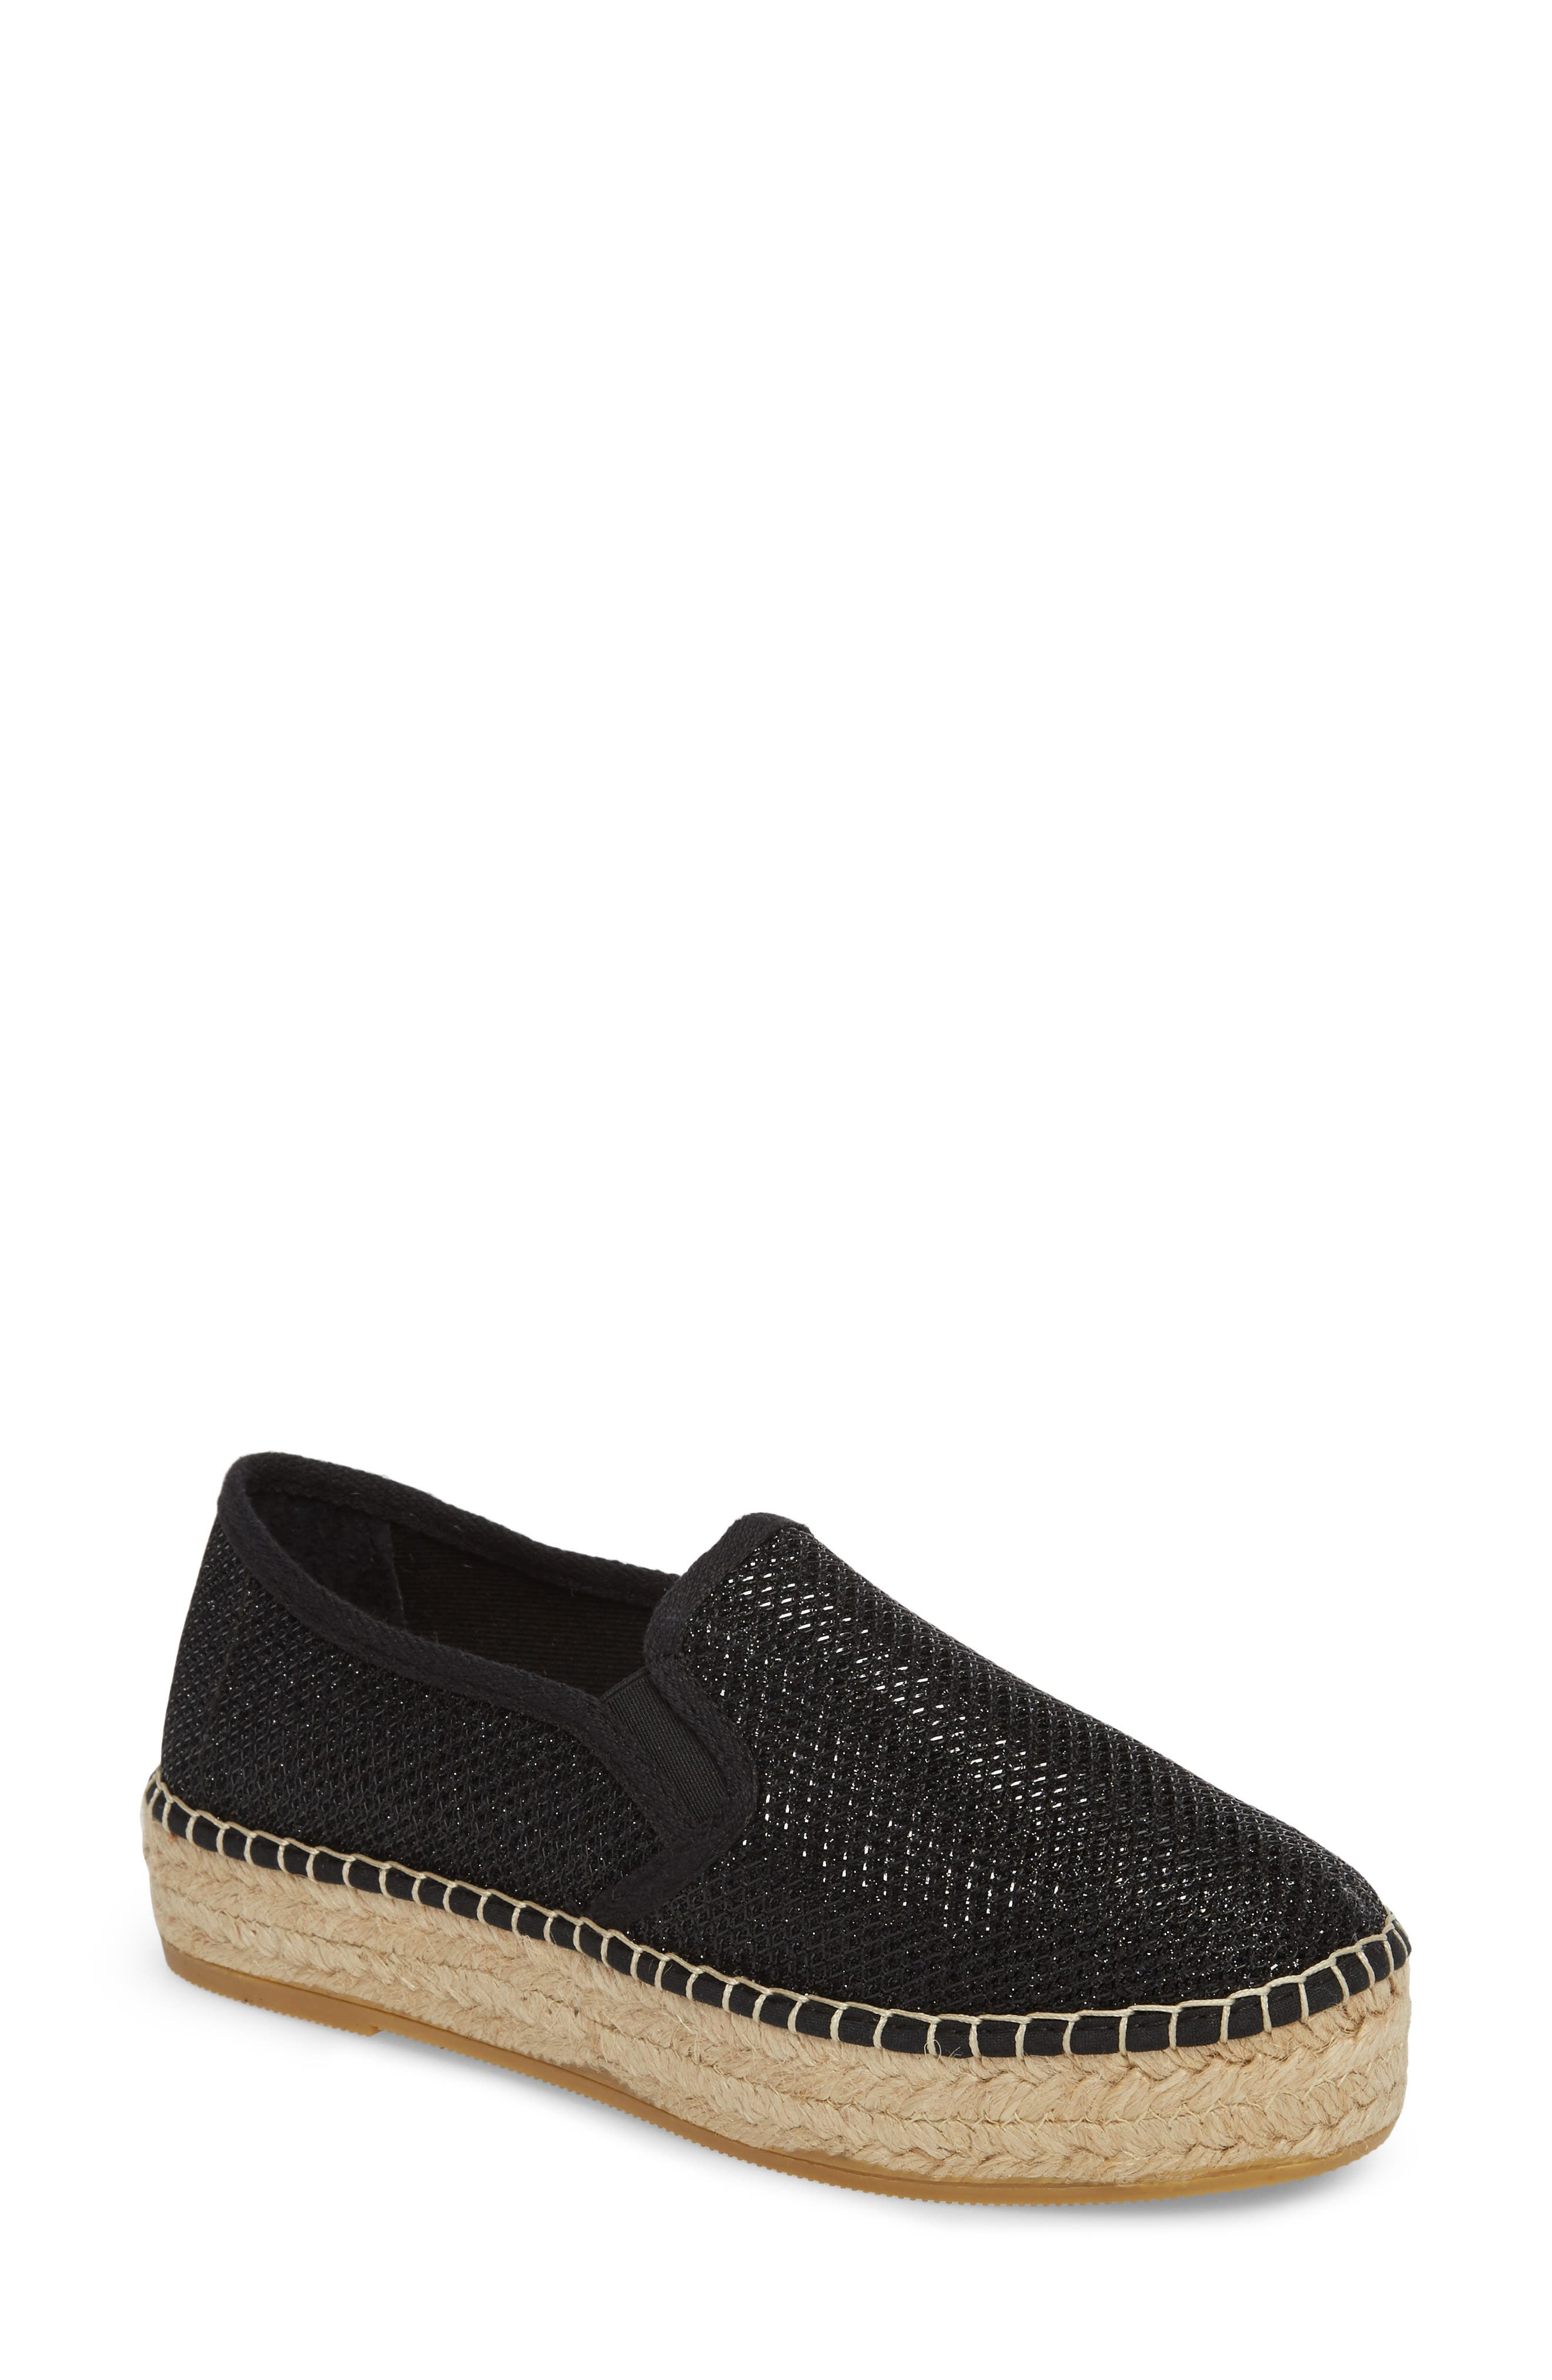 Toni Pons Fonda Platform Espadrille Sneaker, Black